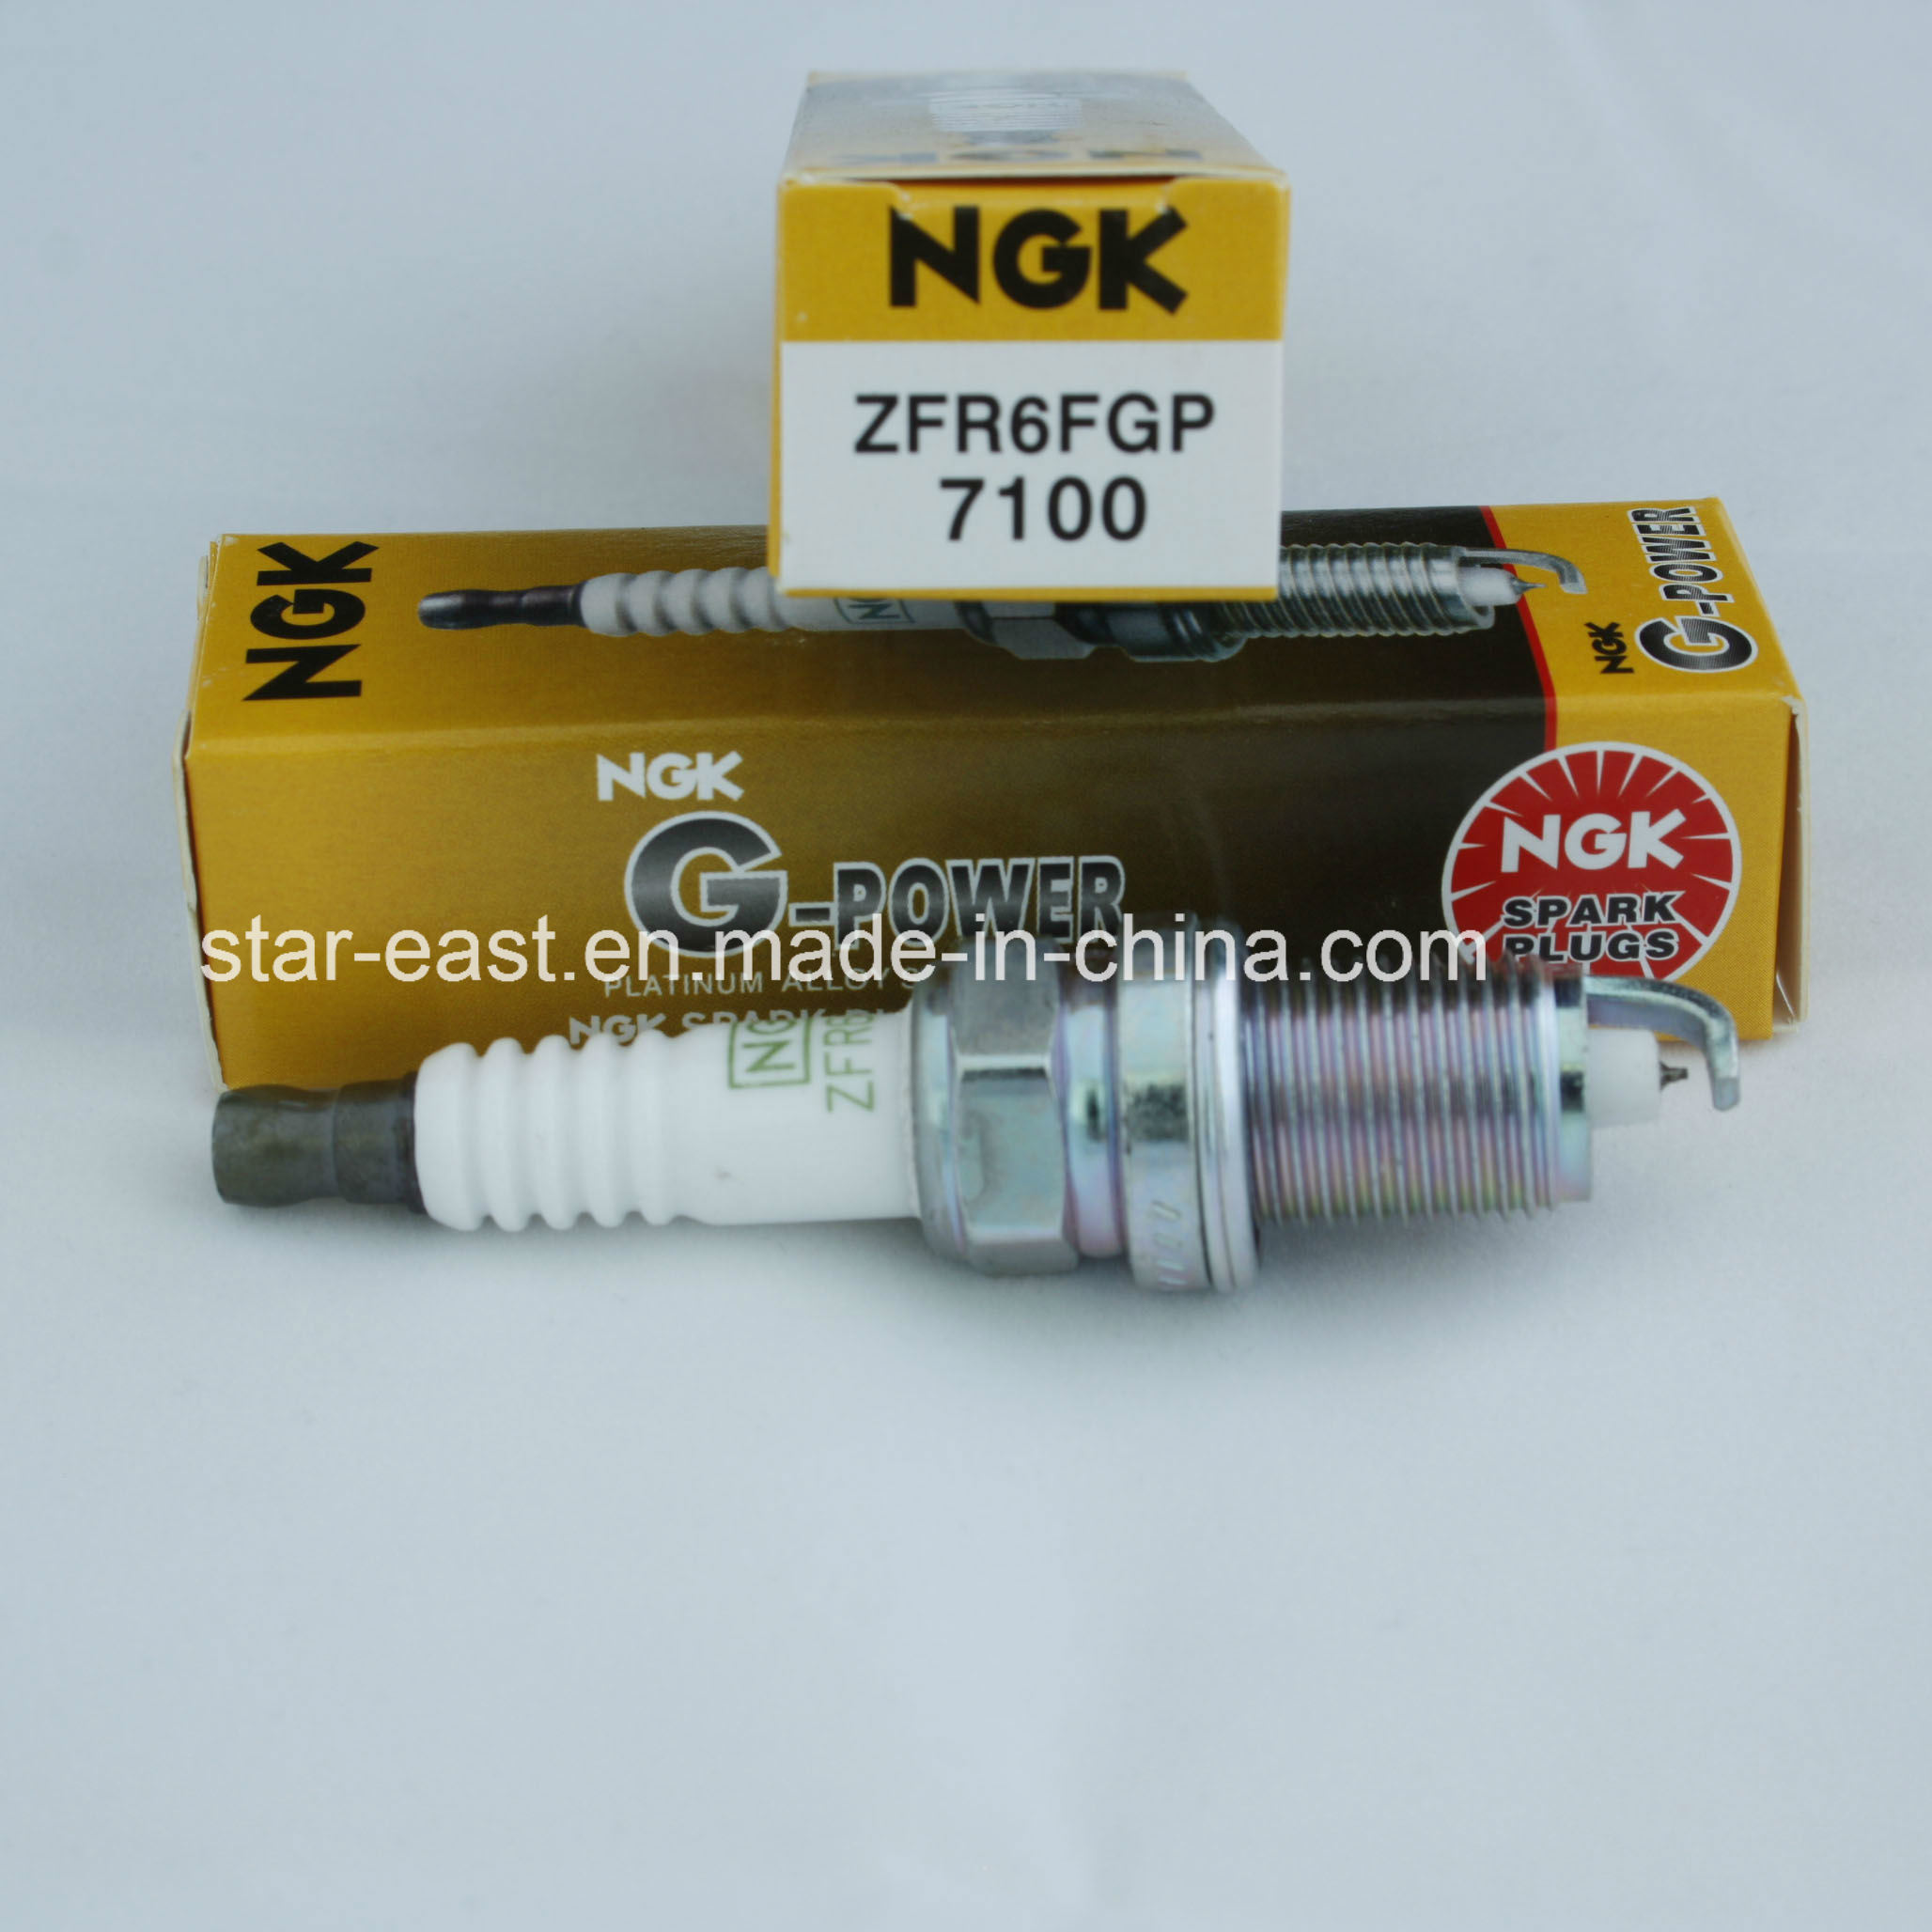 Hight Quality Spark Plug for Ngk Zfr6fgp Honda/Mazda